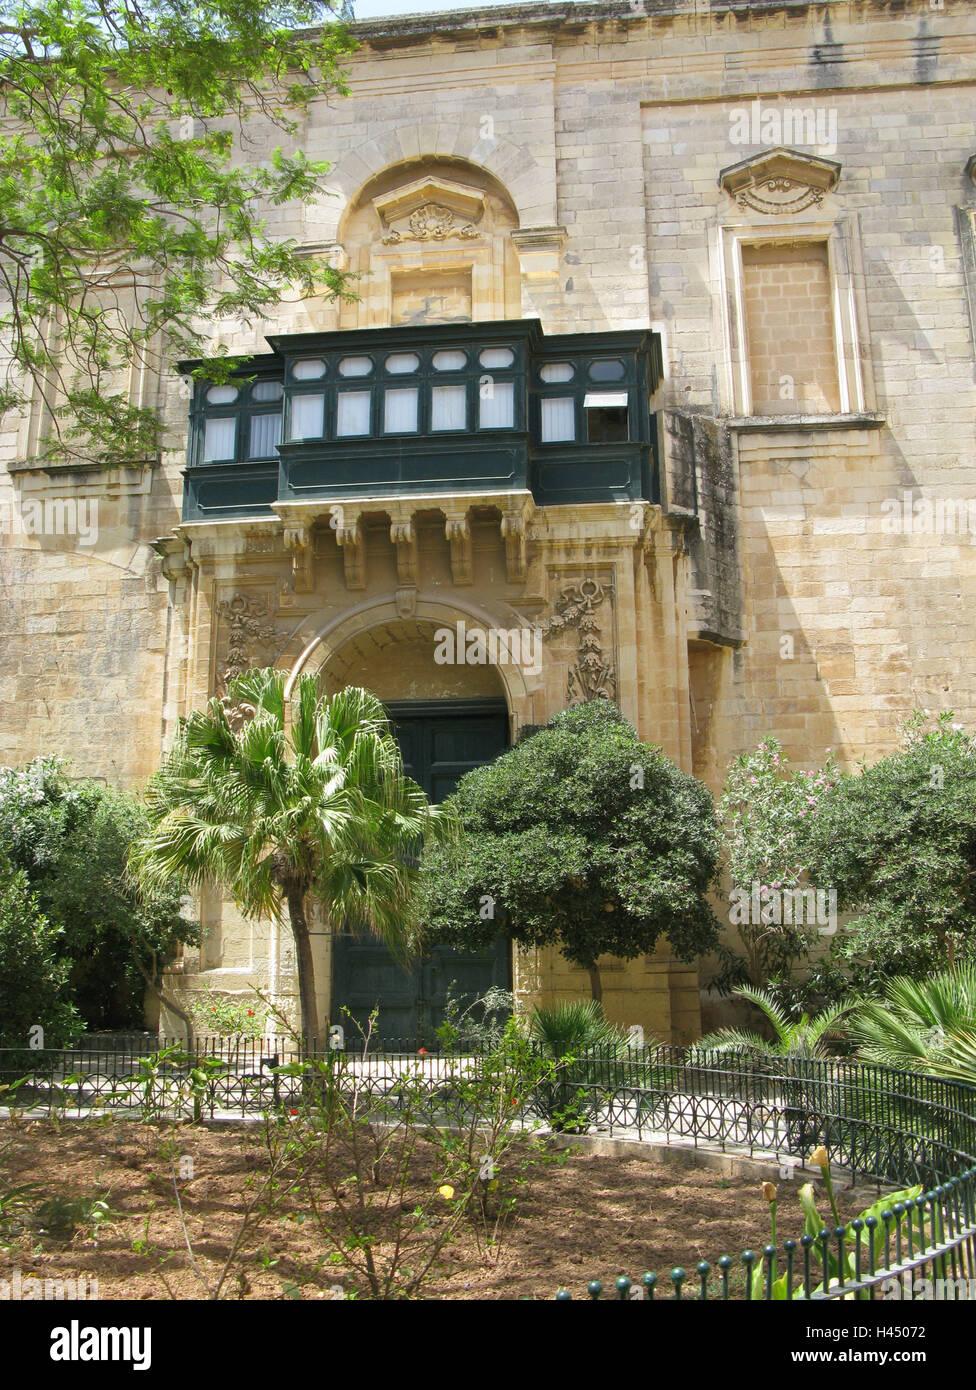 Malta, Valetta, building, facade, balcony, garden, island, town, capital, destination, architecture, house, house - Stock Image